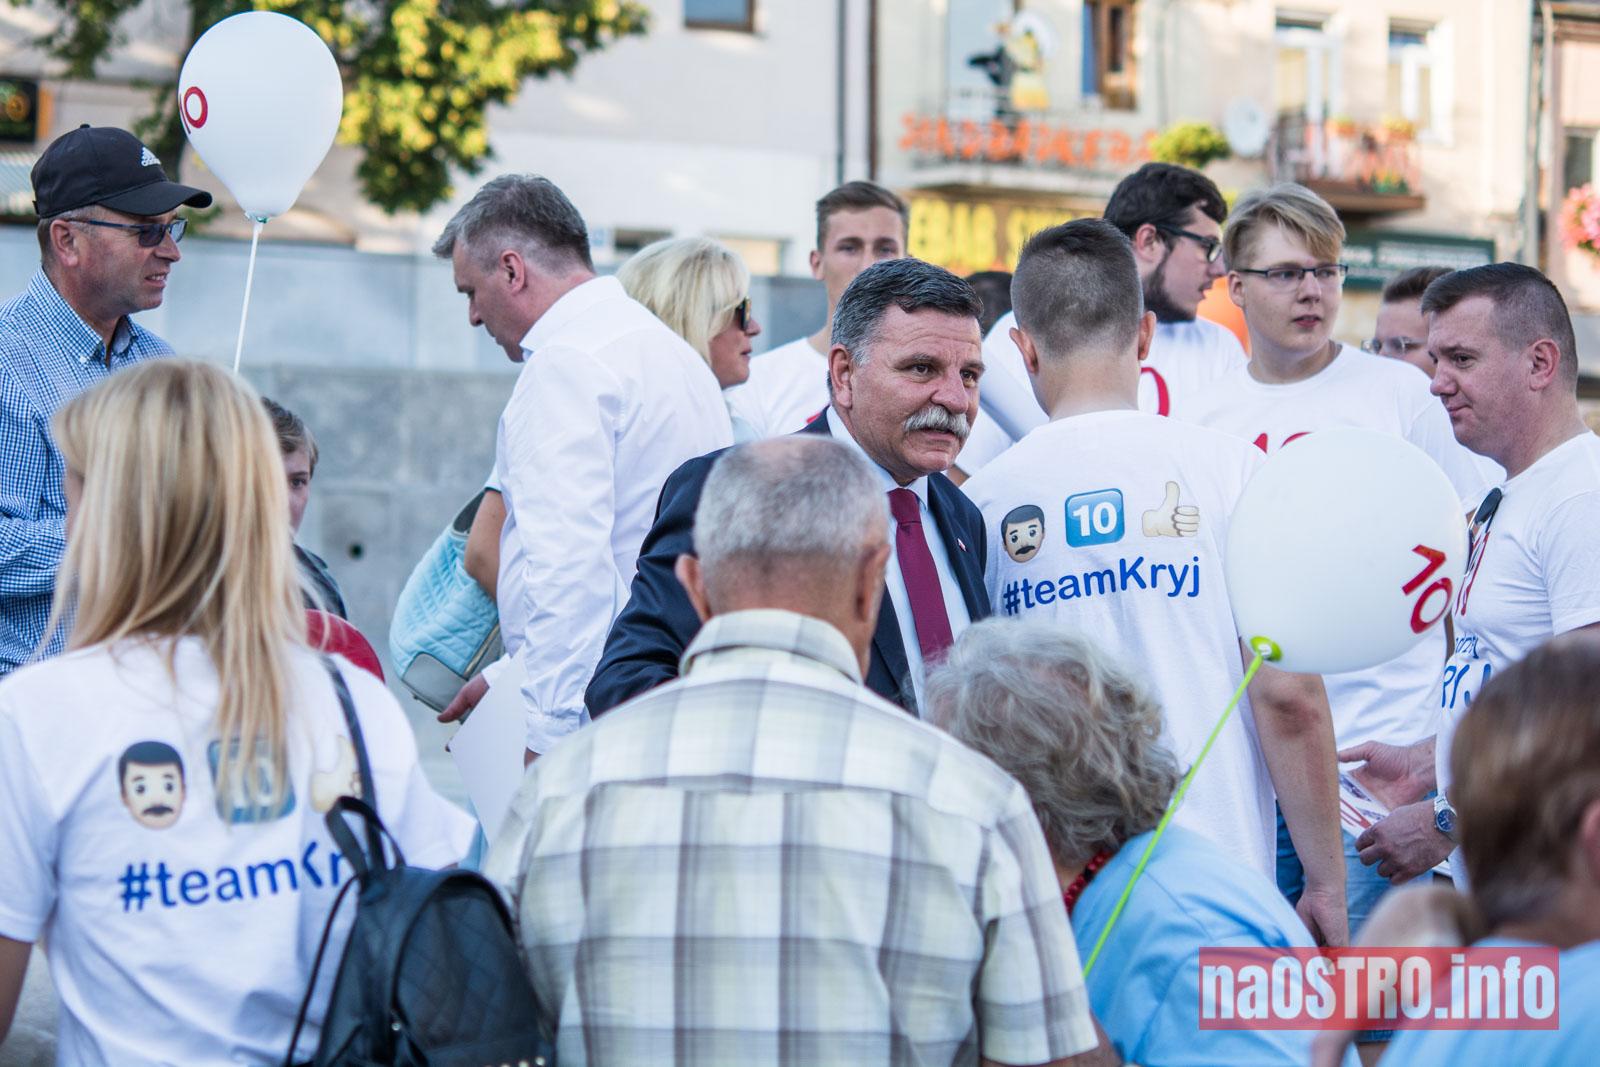 NaOSTRO Andrzej Kryj kampania-31